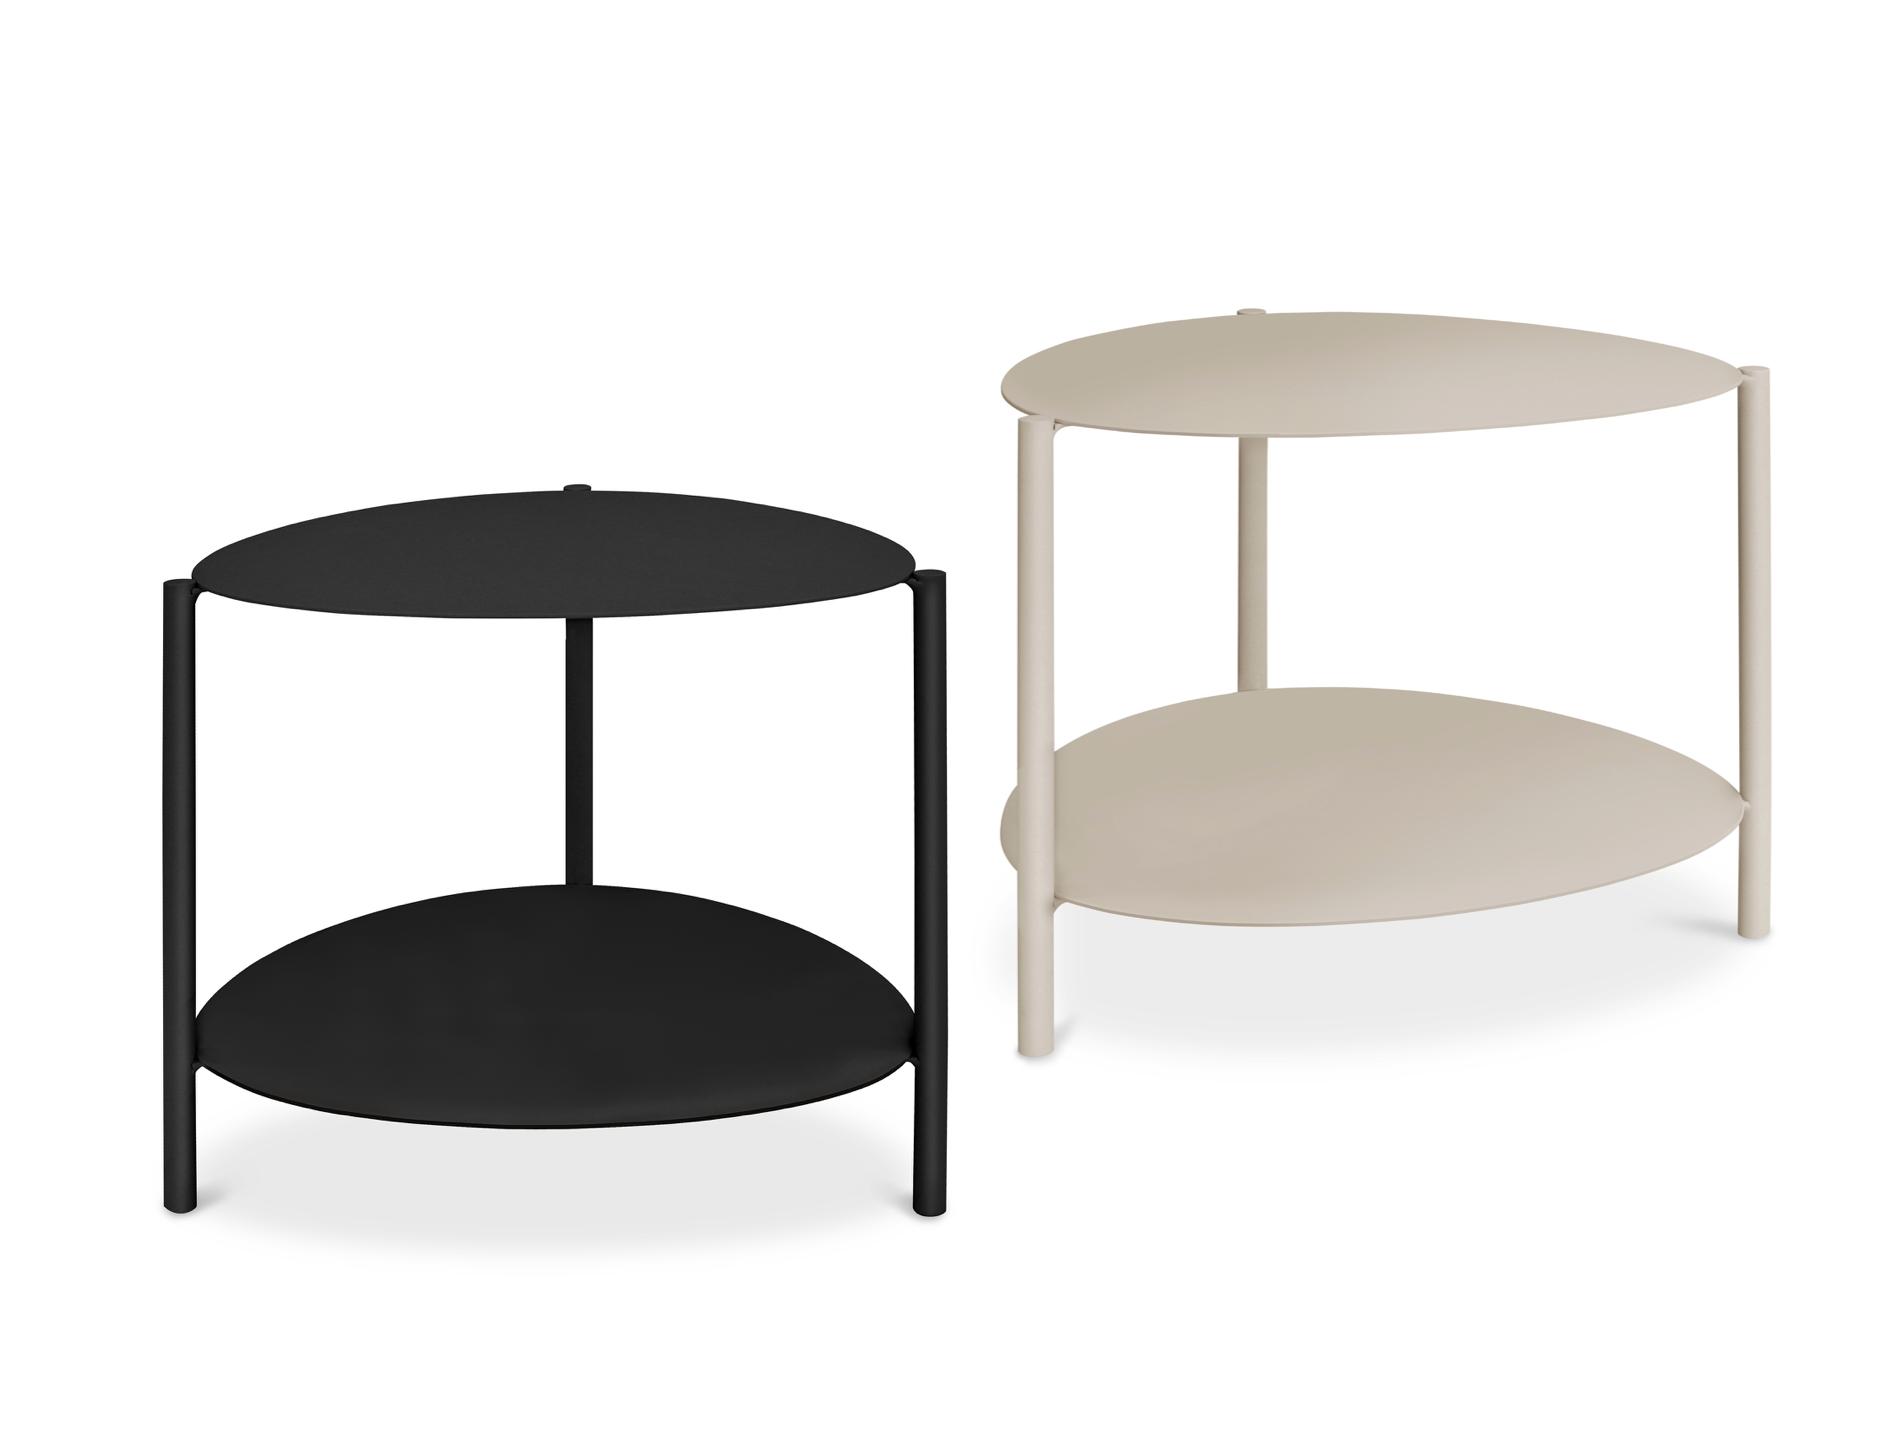 3 Legged Table In Black Capsule Furniture Bedside Table Furniture Coffee Table [ 1434 x 1898 Pixel ]